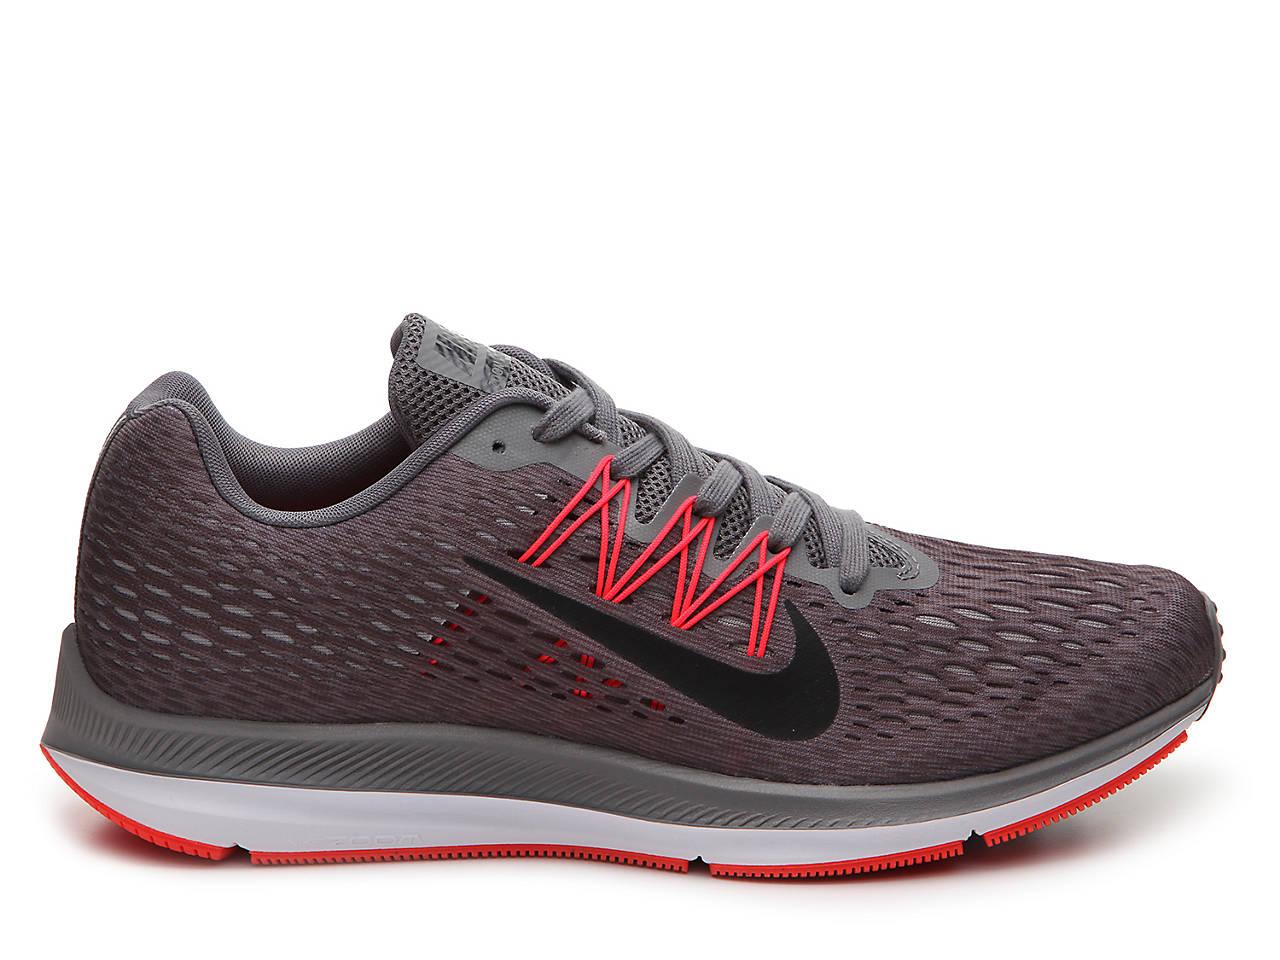 6651244a2b8d Nike Zoom Winflo 5 Lightweight Running Shoe - Men s Men s Shoes